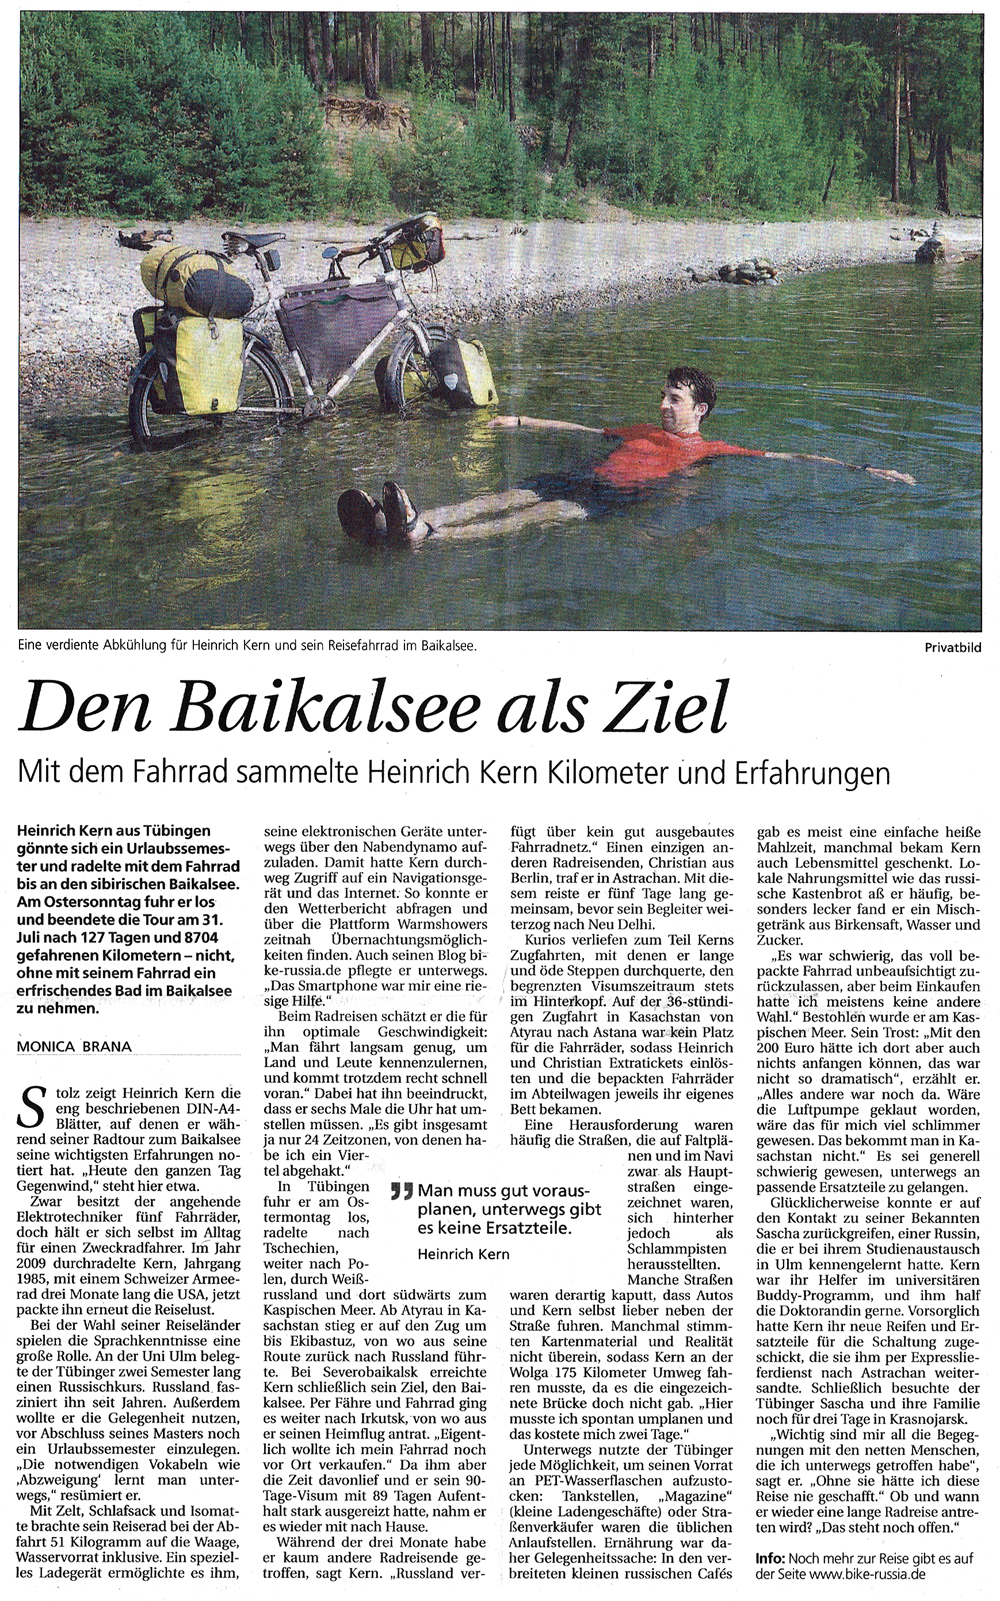 Tagblatt_b1000